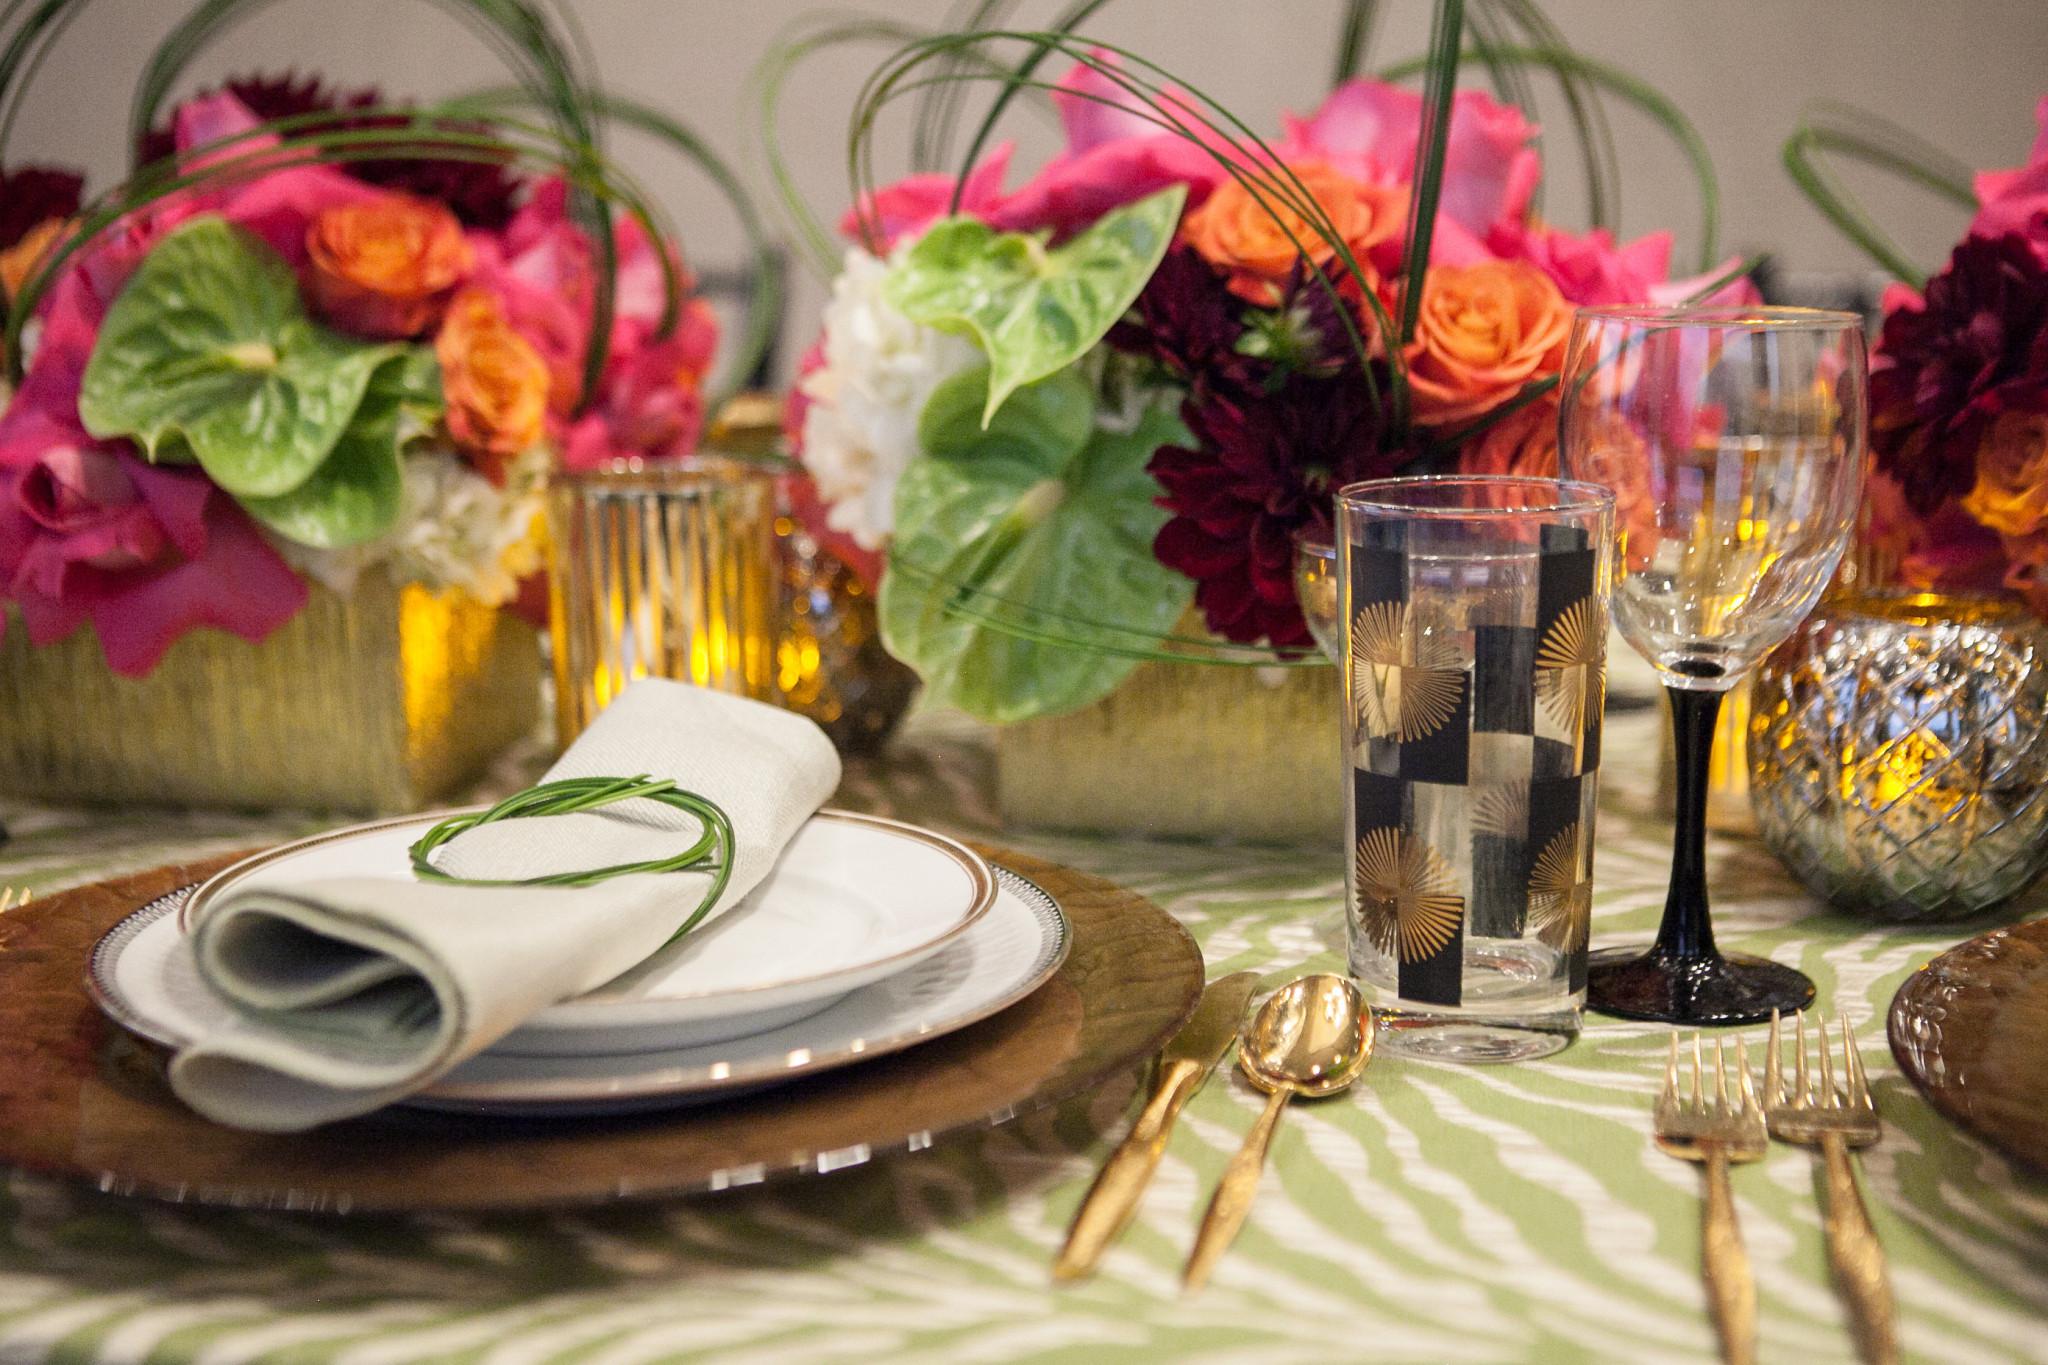 Festive Holiday Tabletop Design